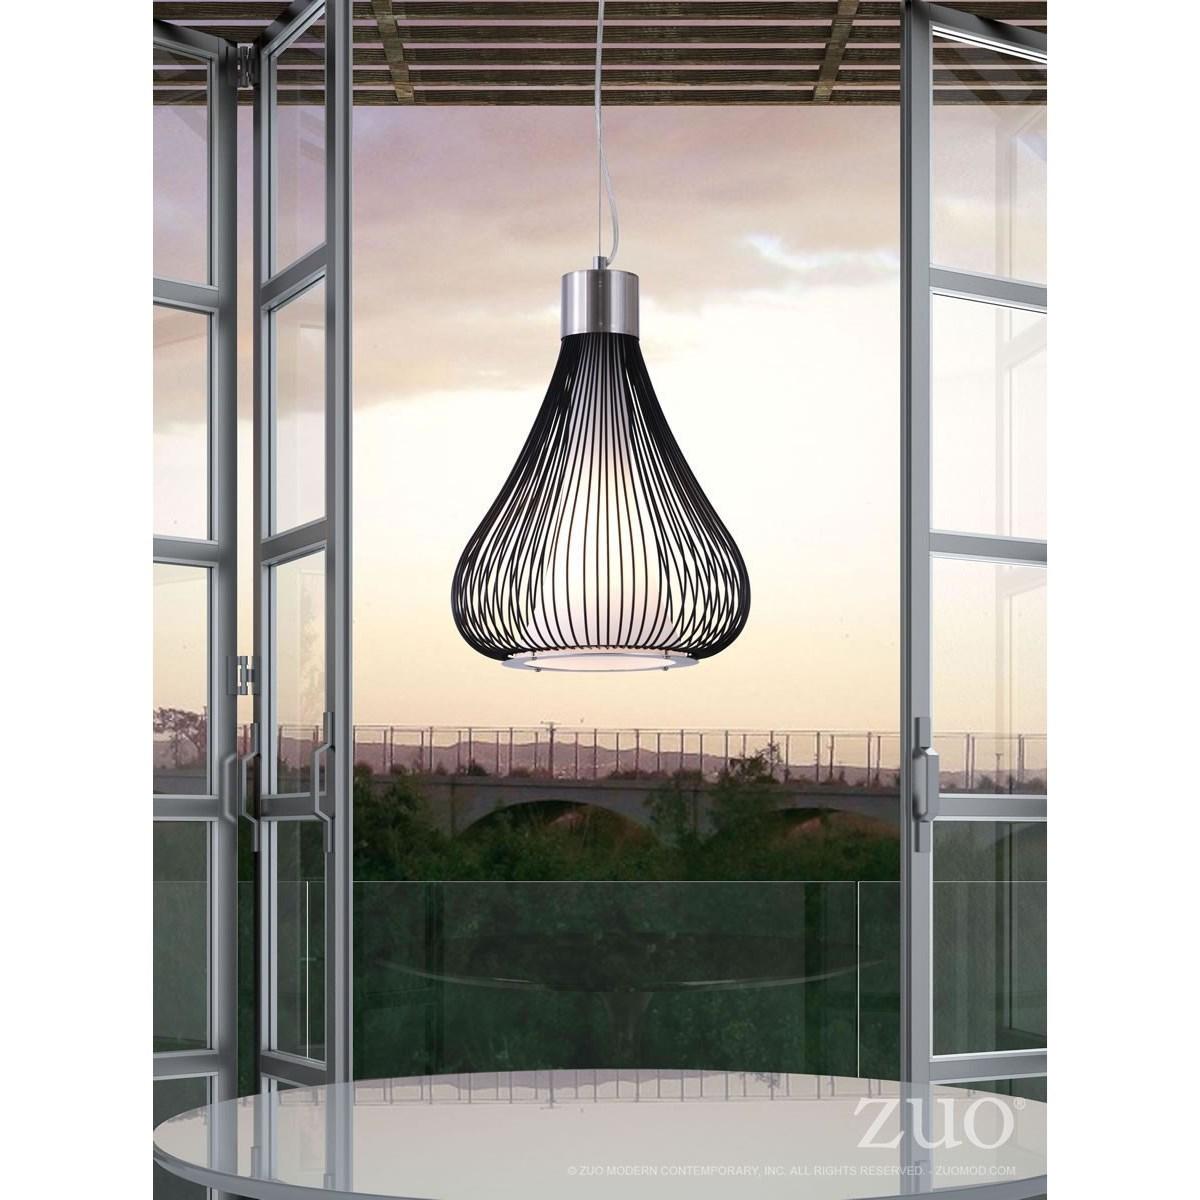 Pure Lighting Interstellar Ceiling Lamp by Zuo at Nassau Furniture and Mattress